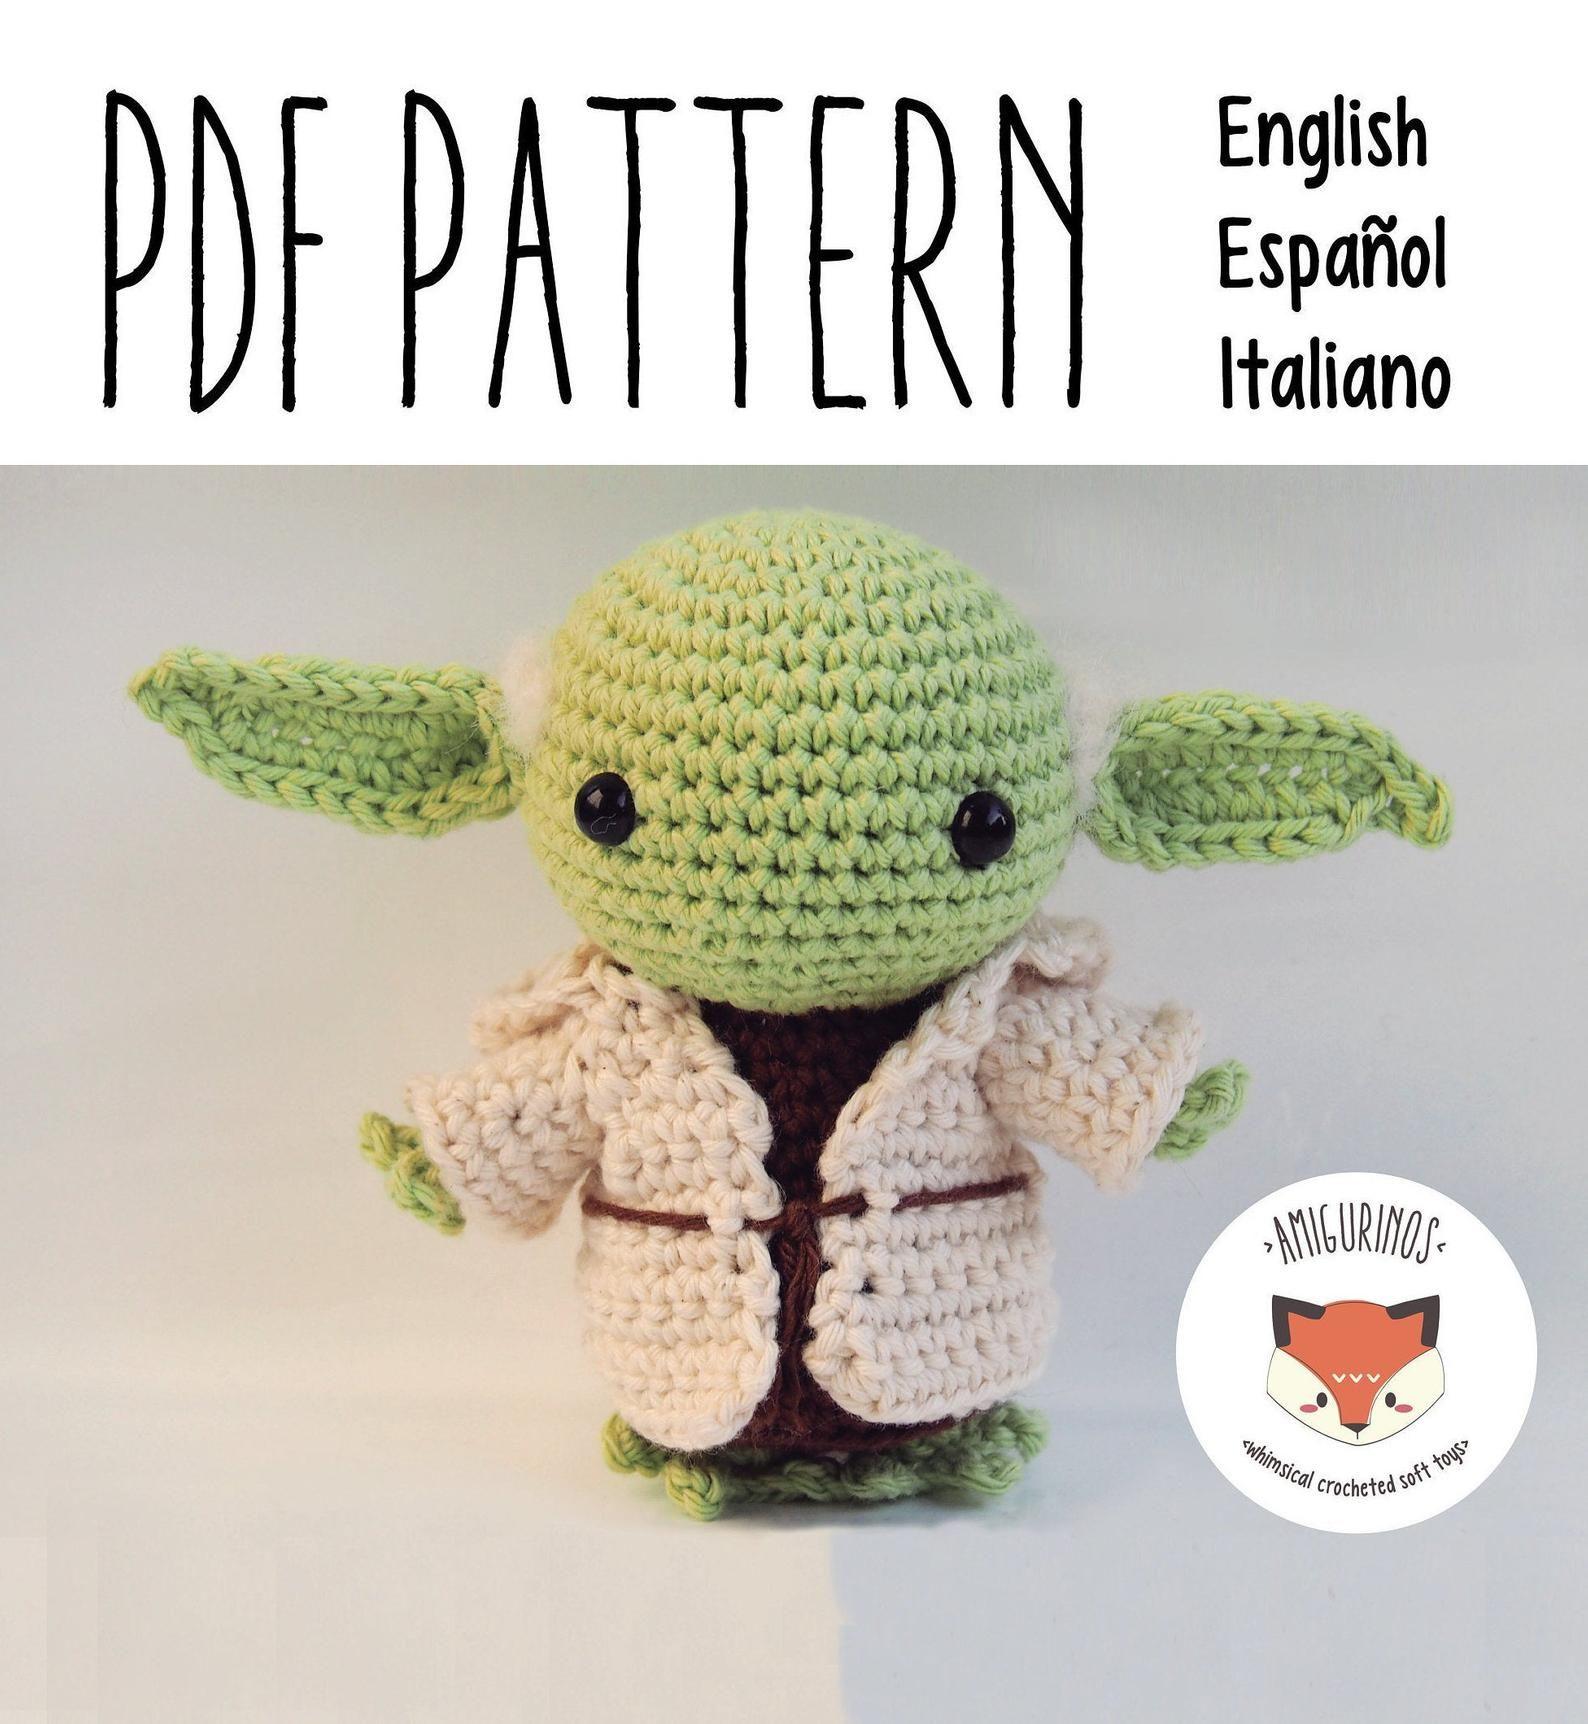 Pdf Crochet Chibi Alien Amigurumi Pattern Detailed Etsy Amigurumi Free Pattern Amigurumi Pattern Star Wars Crochet